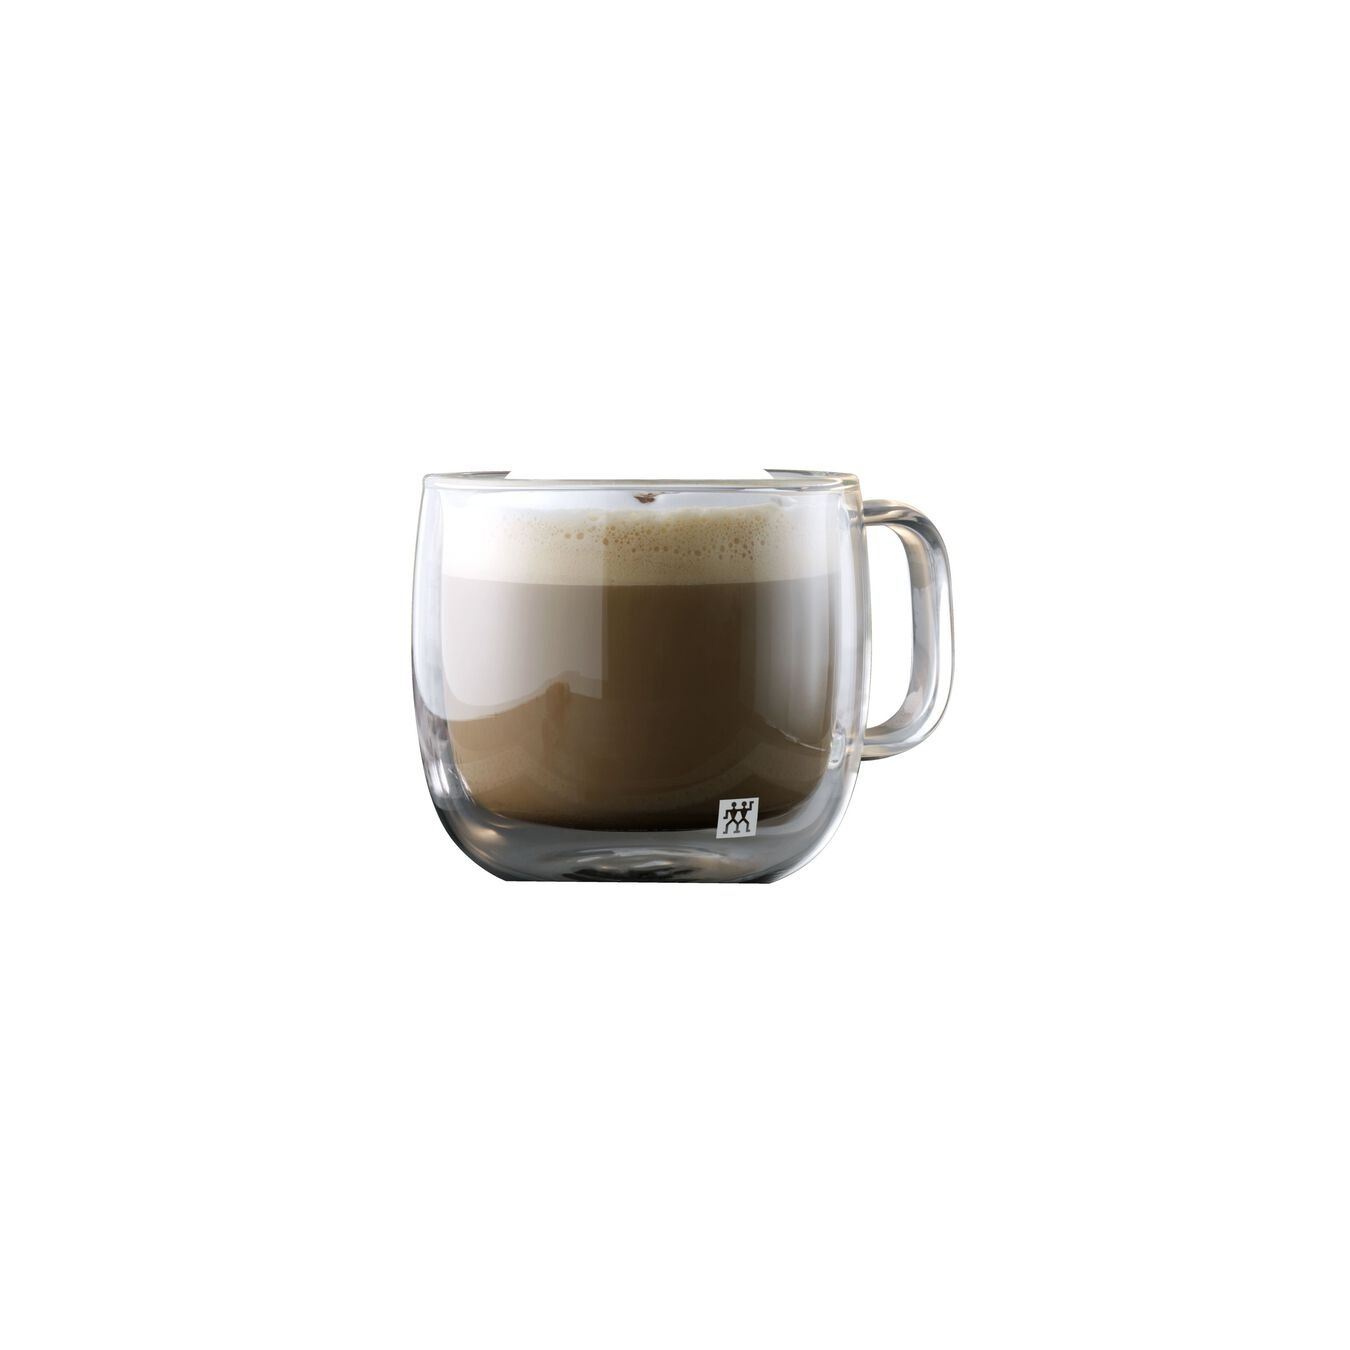 8 Piece Cappuccino Mug Set - Value Pack,,large 5